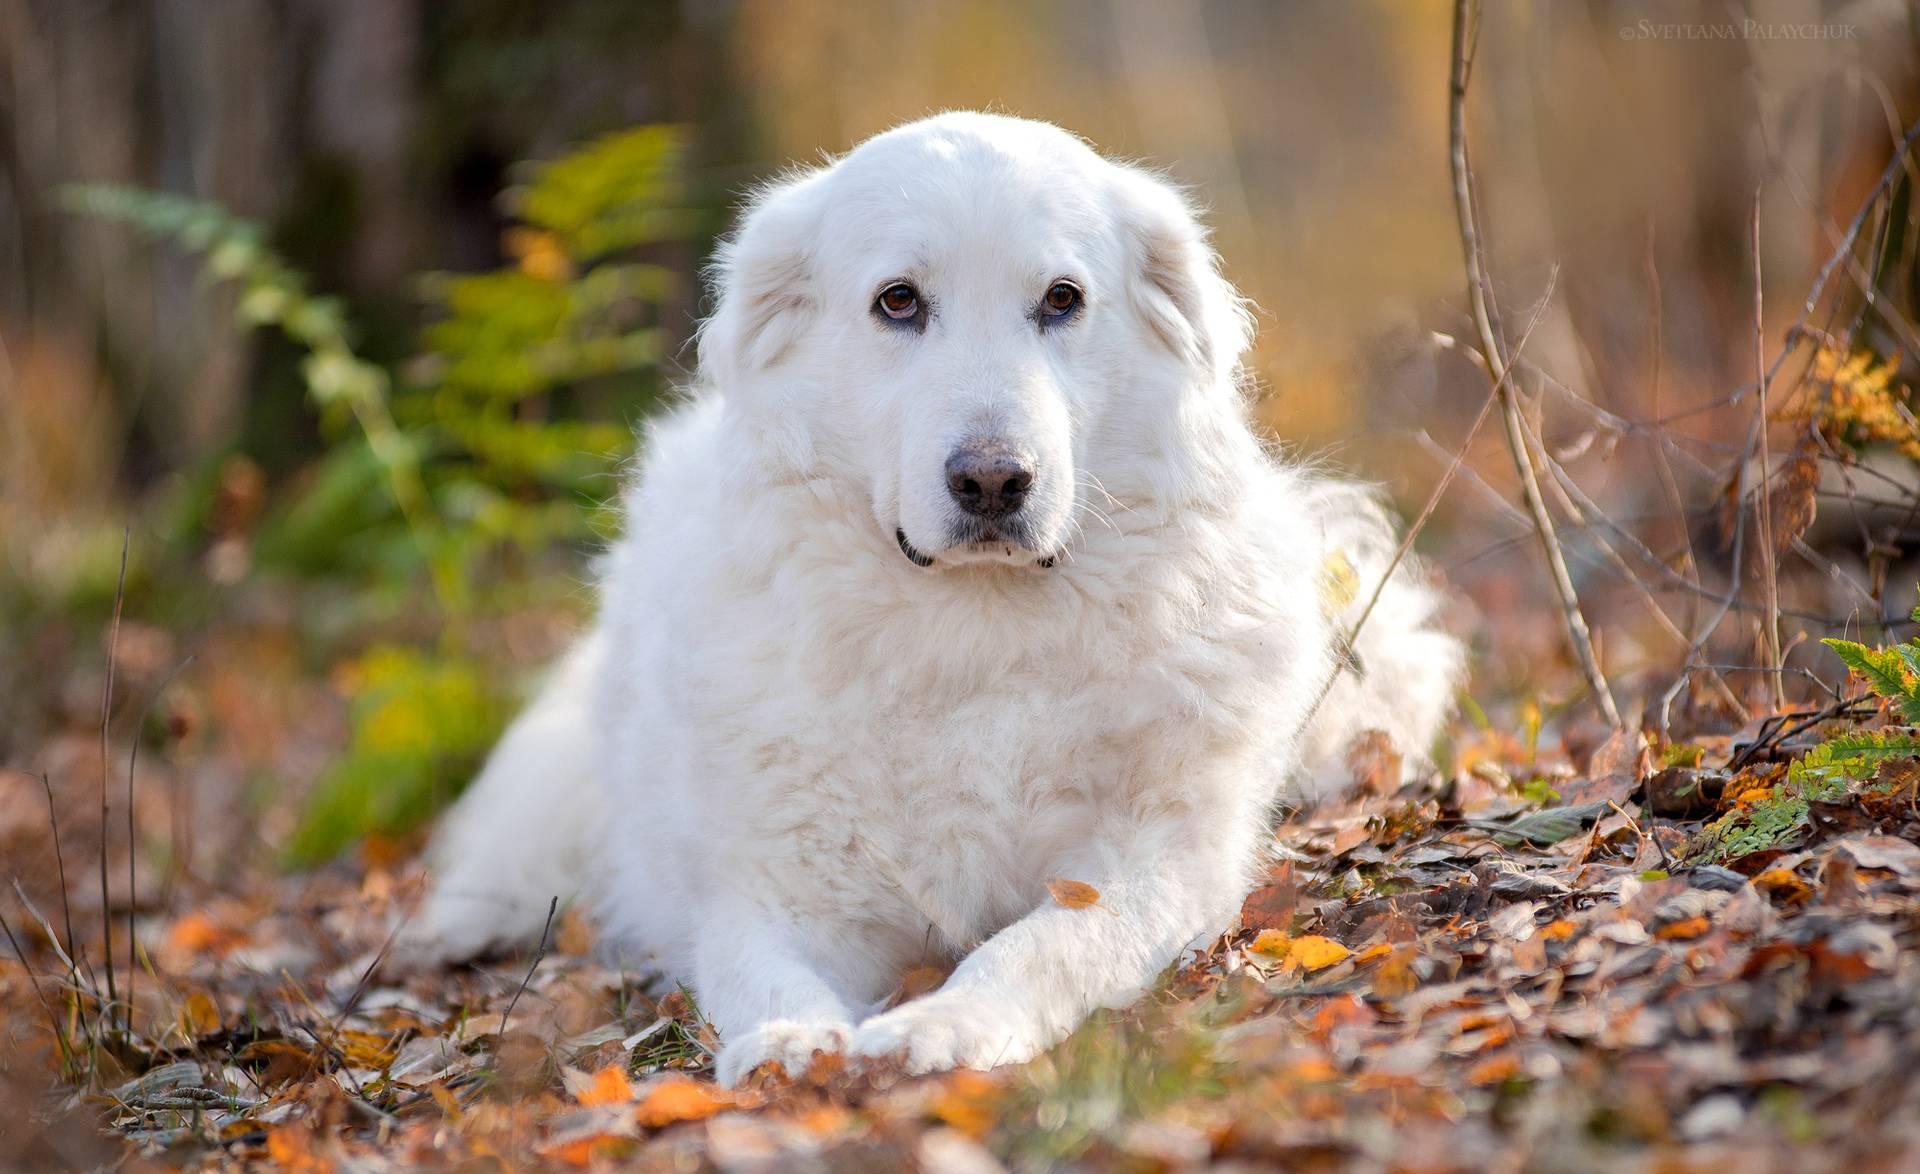 Мареммо-абруццкая овчарка: плюсы и минусы породы собак мареммо-абруццкая овчарка: плюсы и минусы породы собак